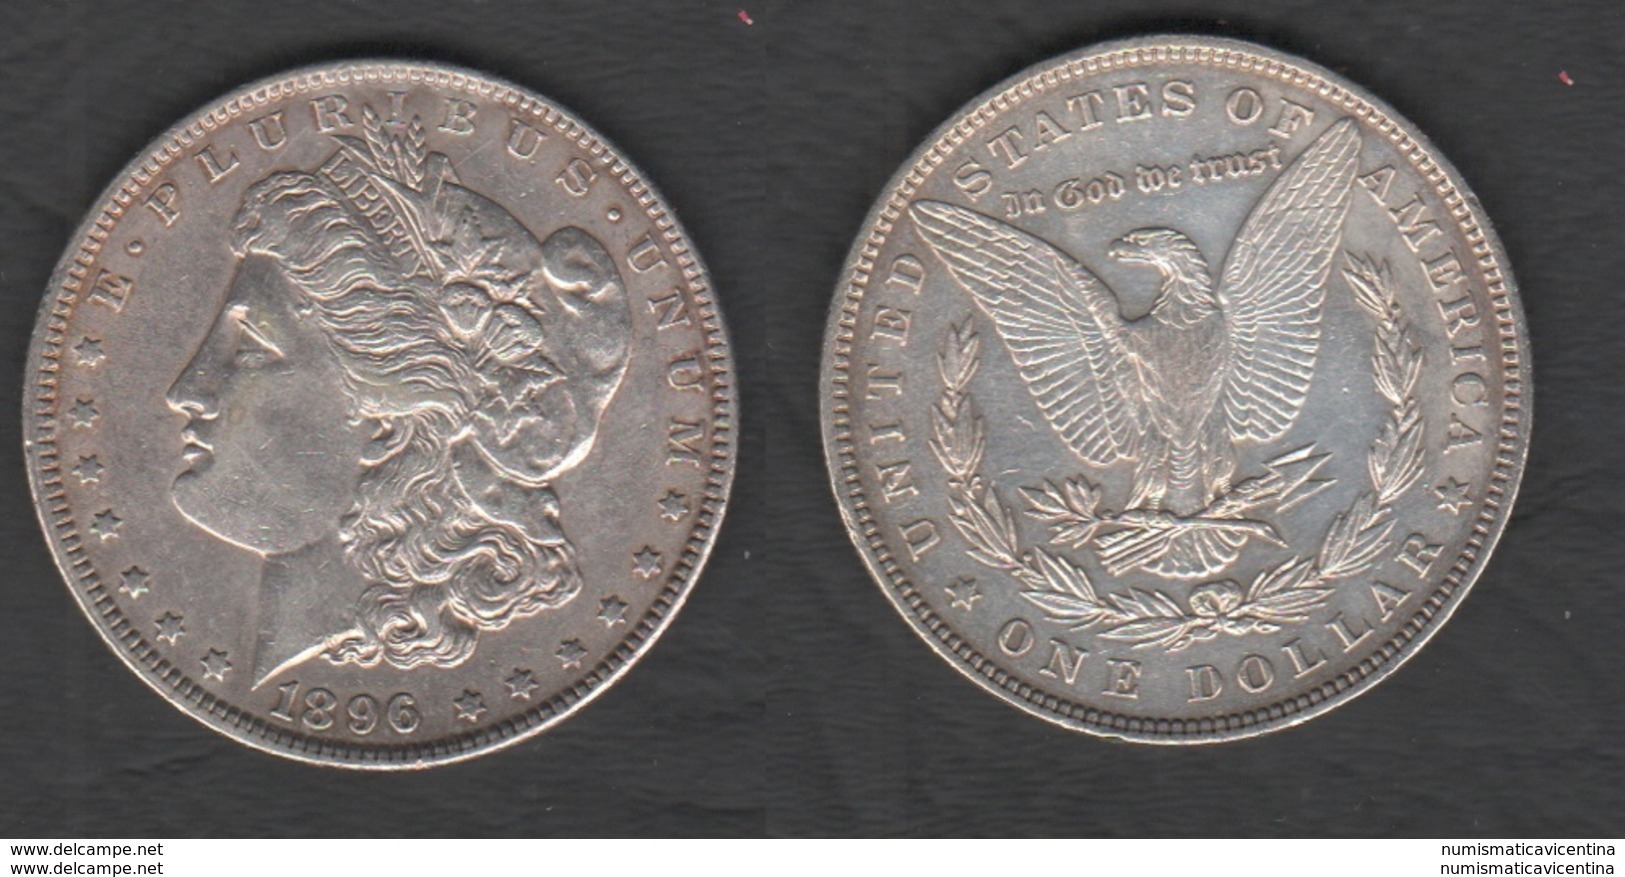 Dollaro 1896 Usa Dollar United States Of America Dollari $ - Emissioni Federali